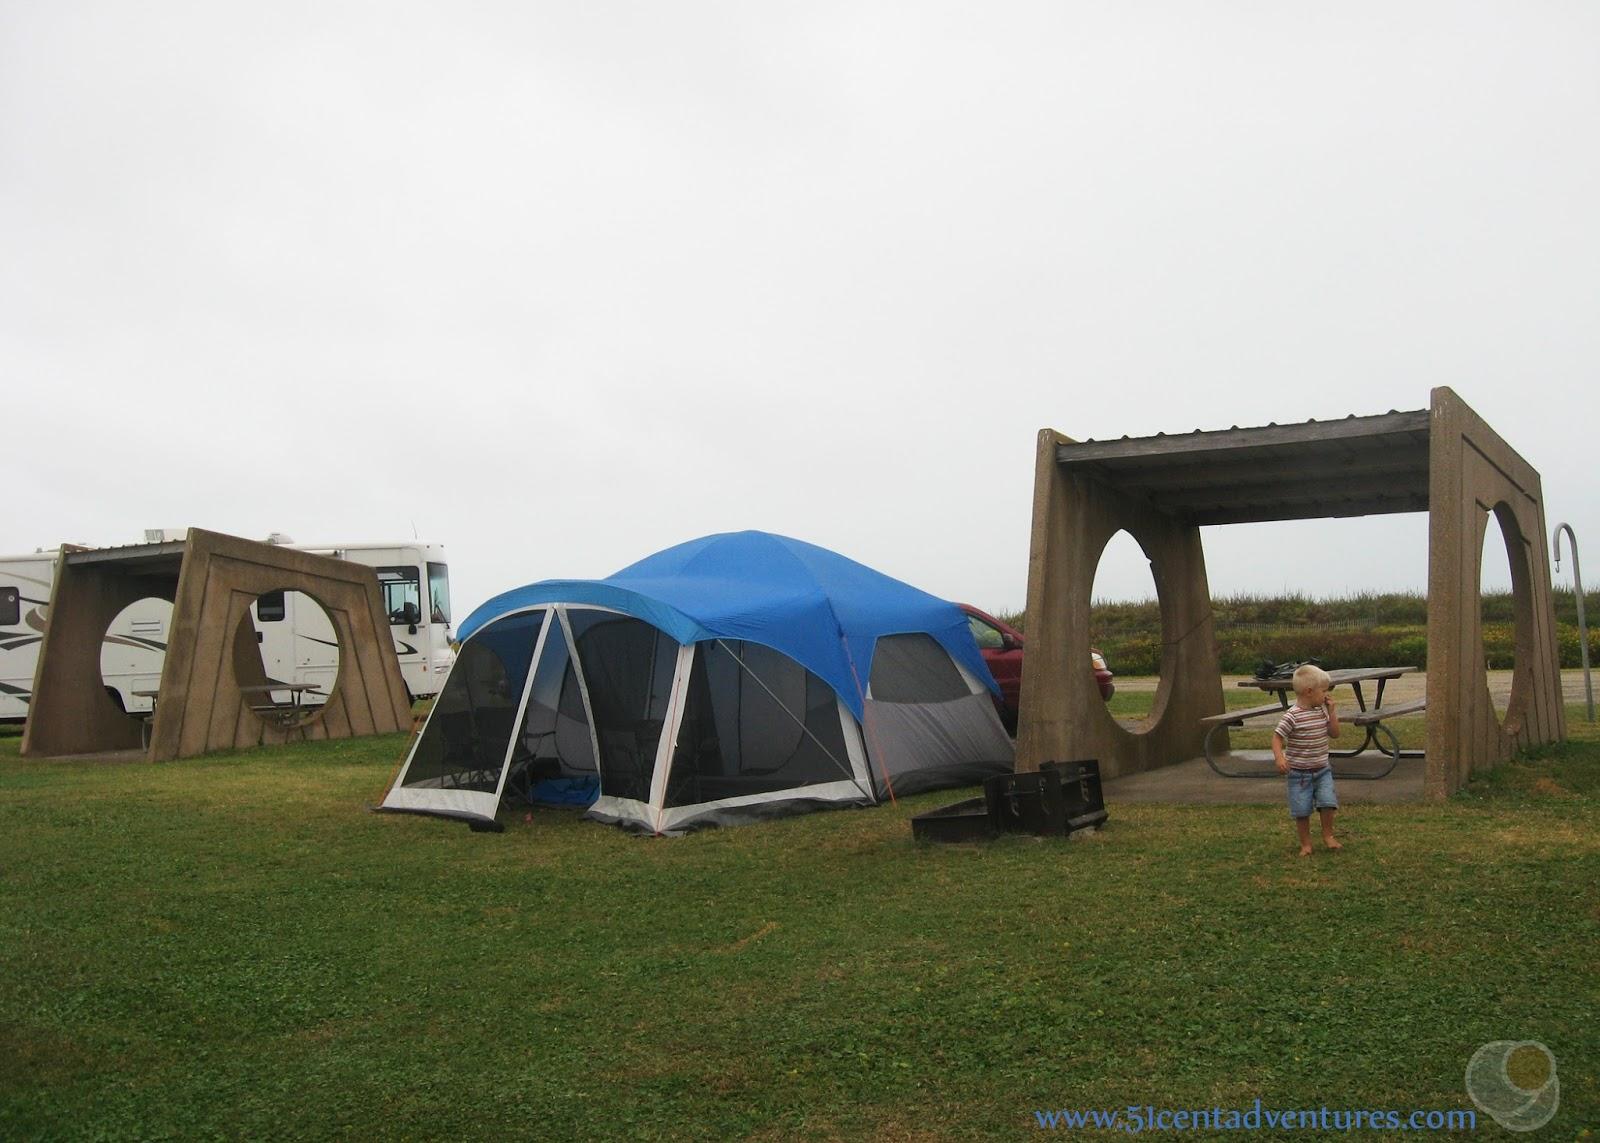 51 Cent Adventures Galveston Island State Park